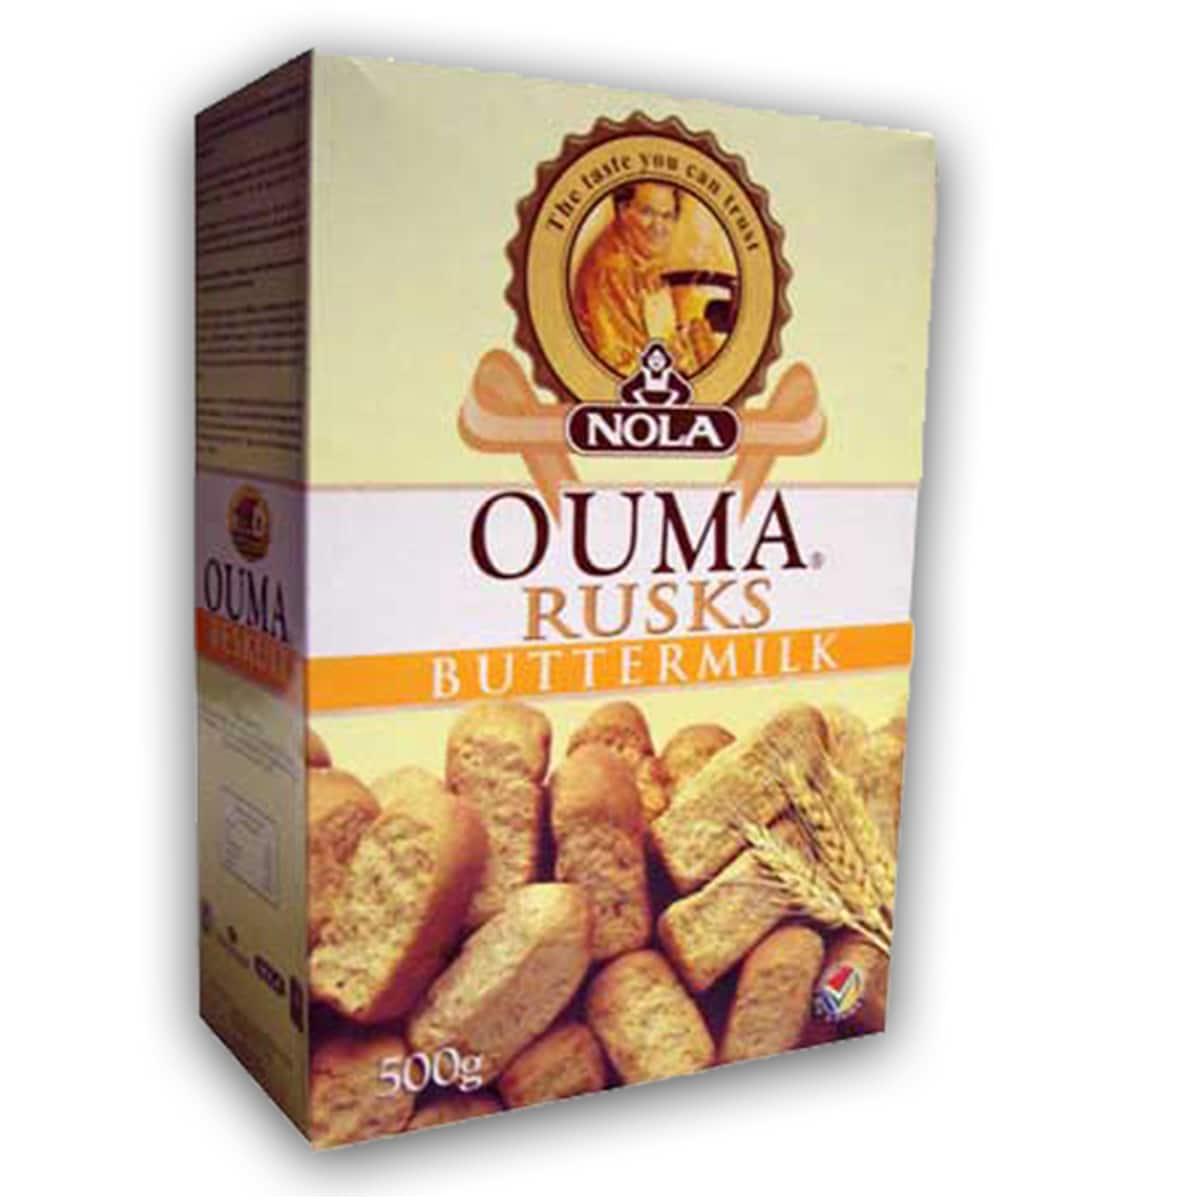 Buy Ouma Buttermilk Rusks - 500 gm